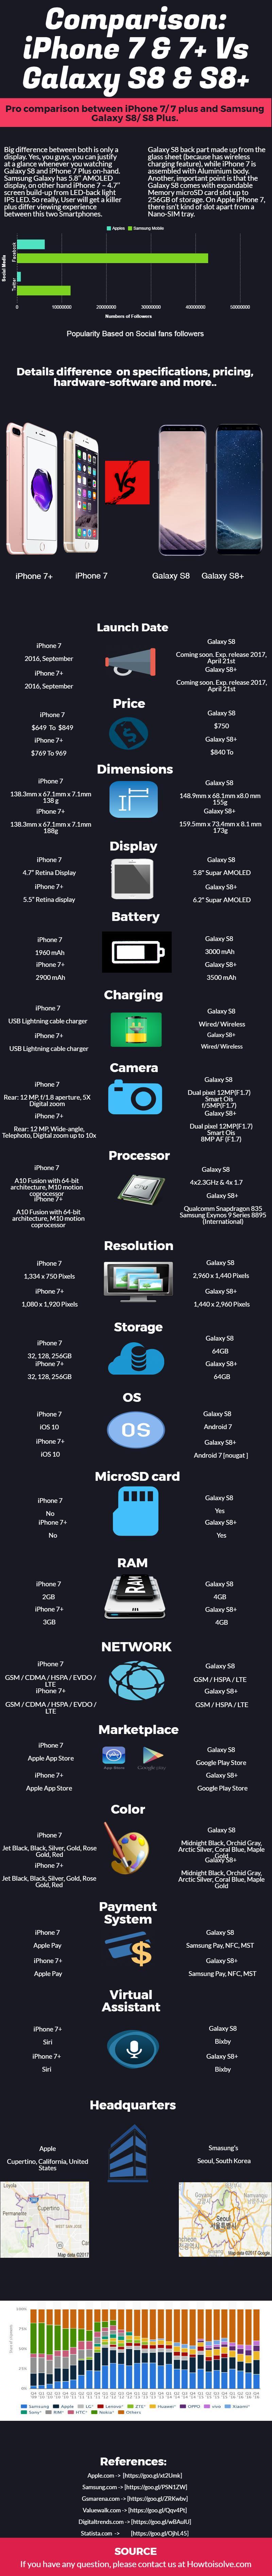 iPhone-7-vs-Galaxy-S8-iPhone-7-Plus-vs-Galaxy-S8-Plus-Infographic new